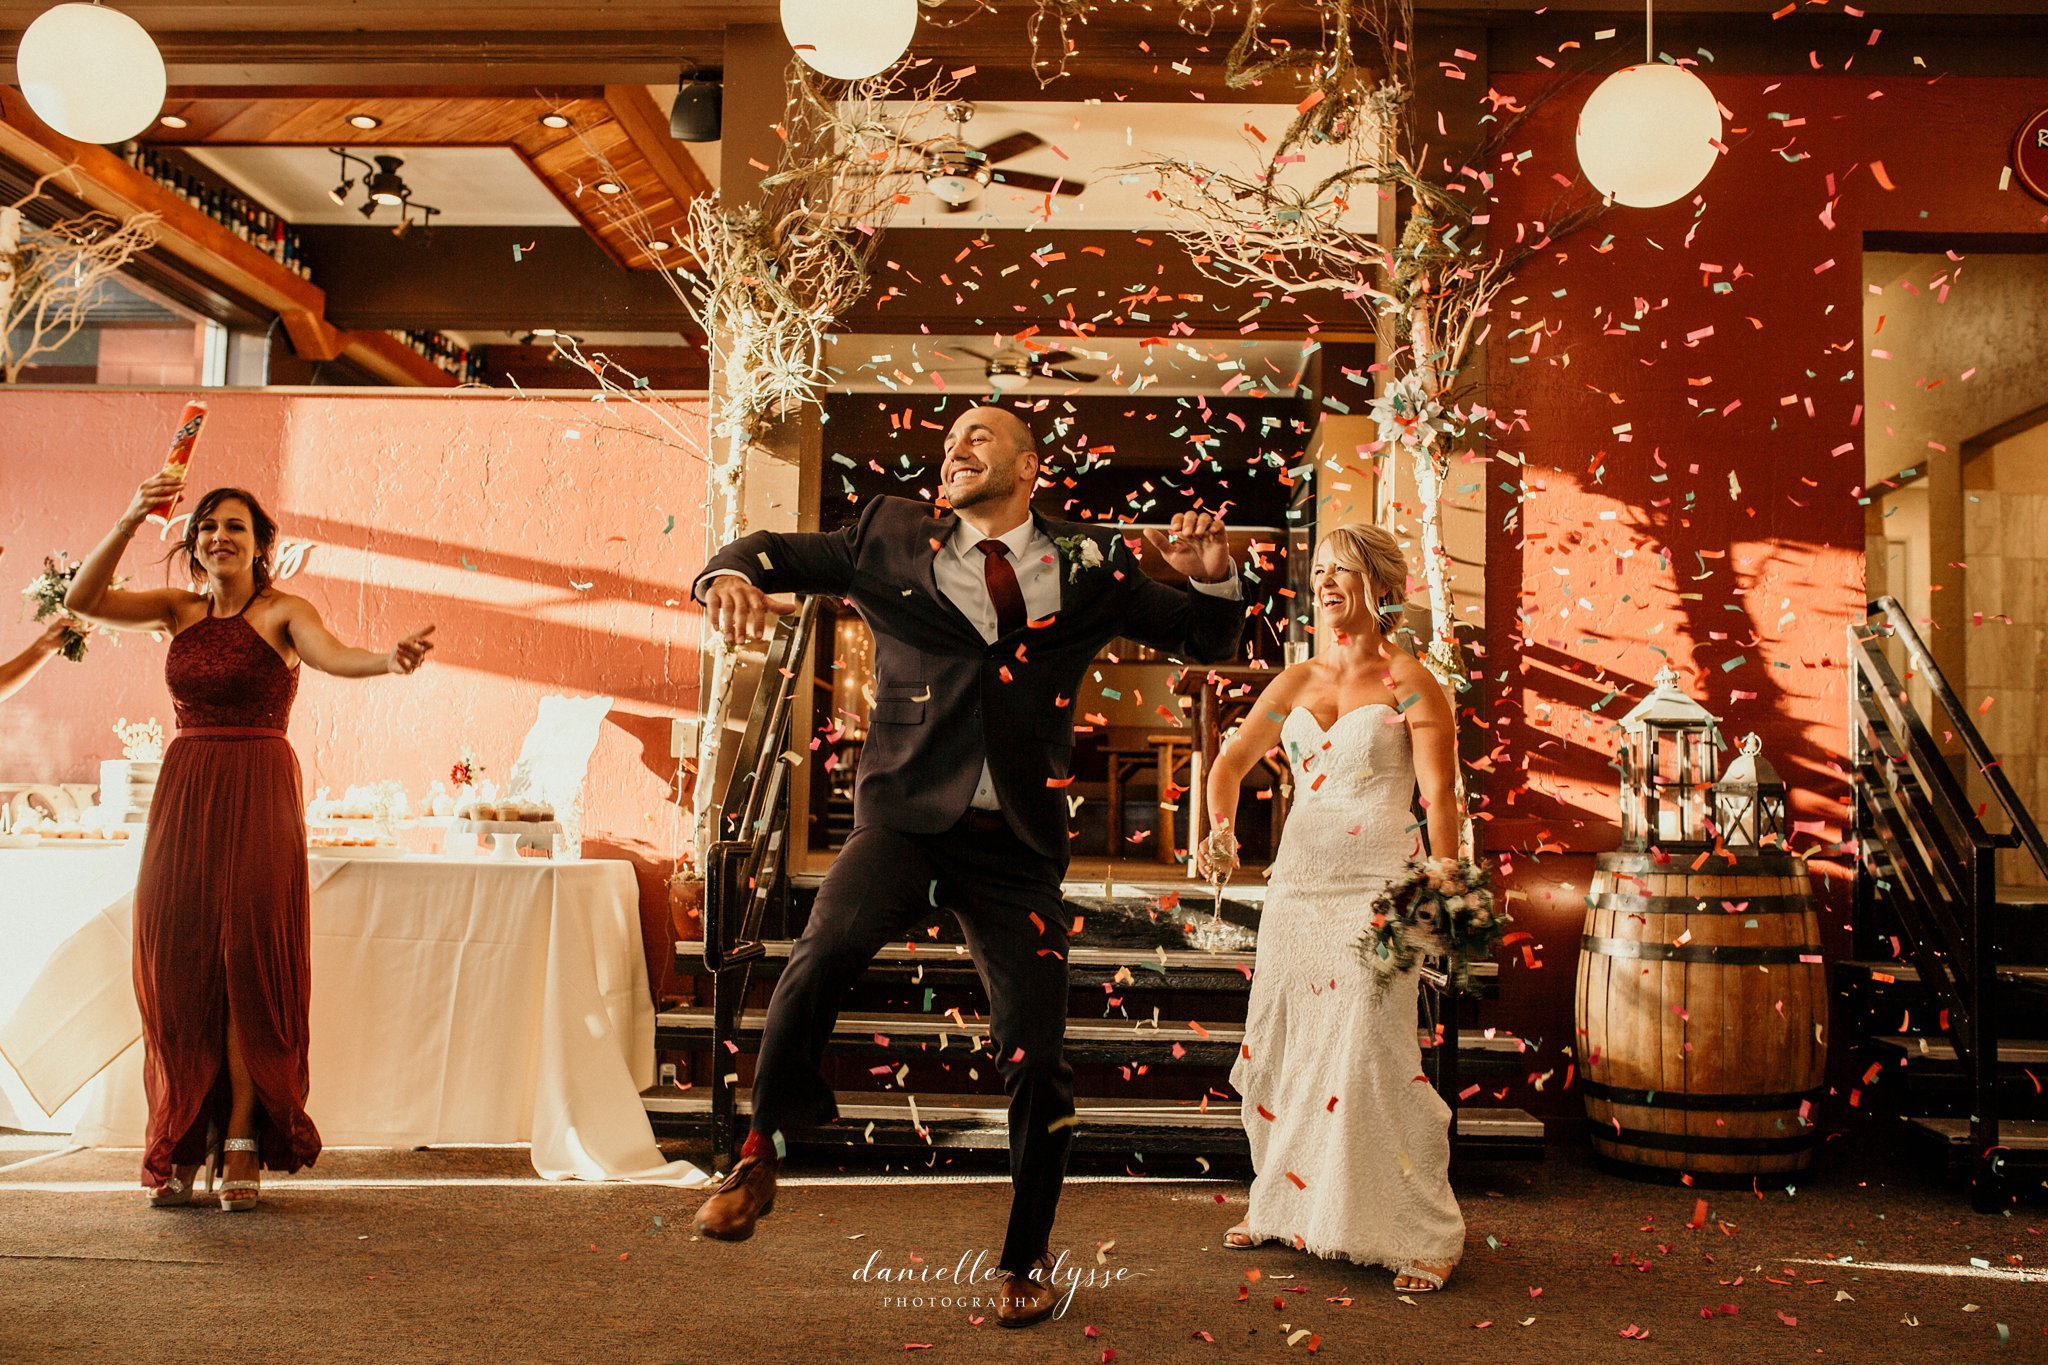 180831_wedding_stephanie_heavenly_south_lake_tahoe_danielle_alysse_photography_destination_blog_951_WEB.jpg